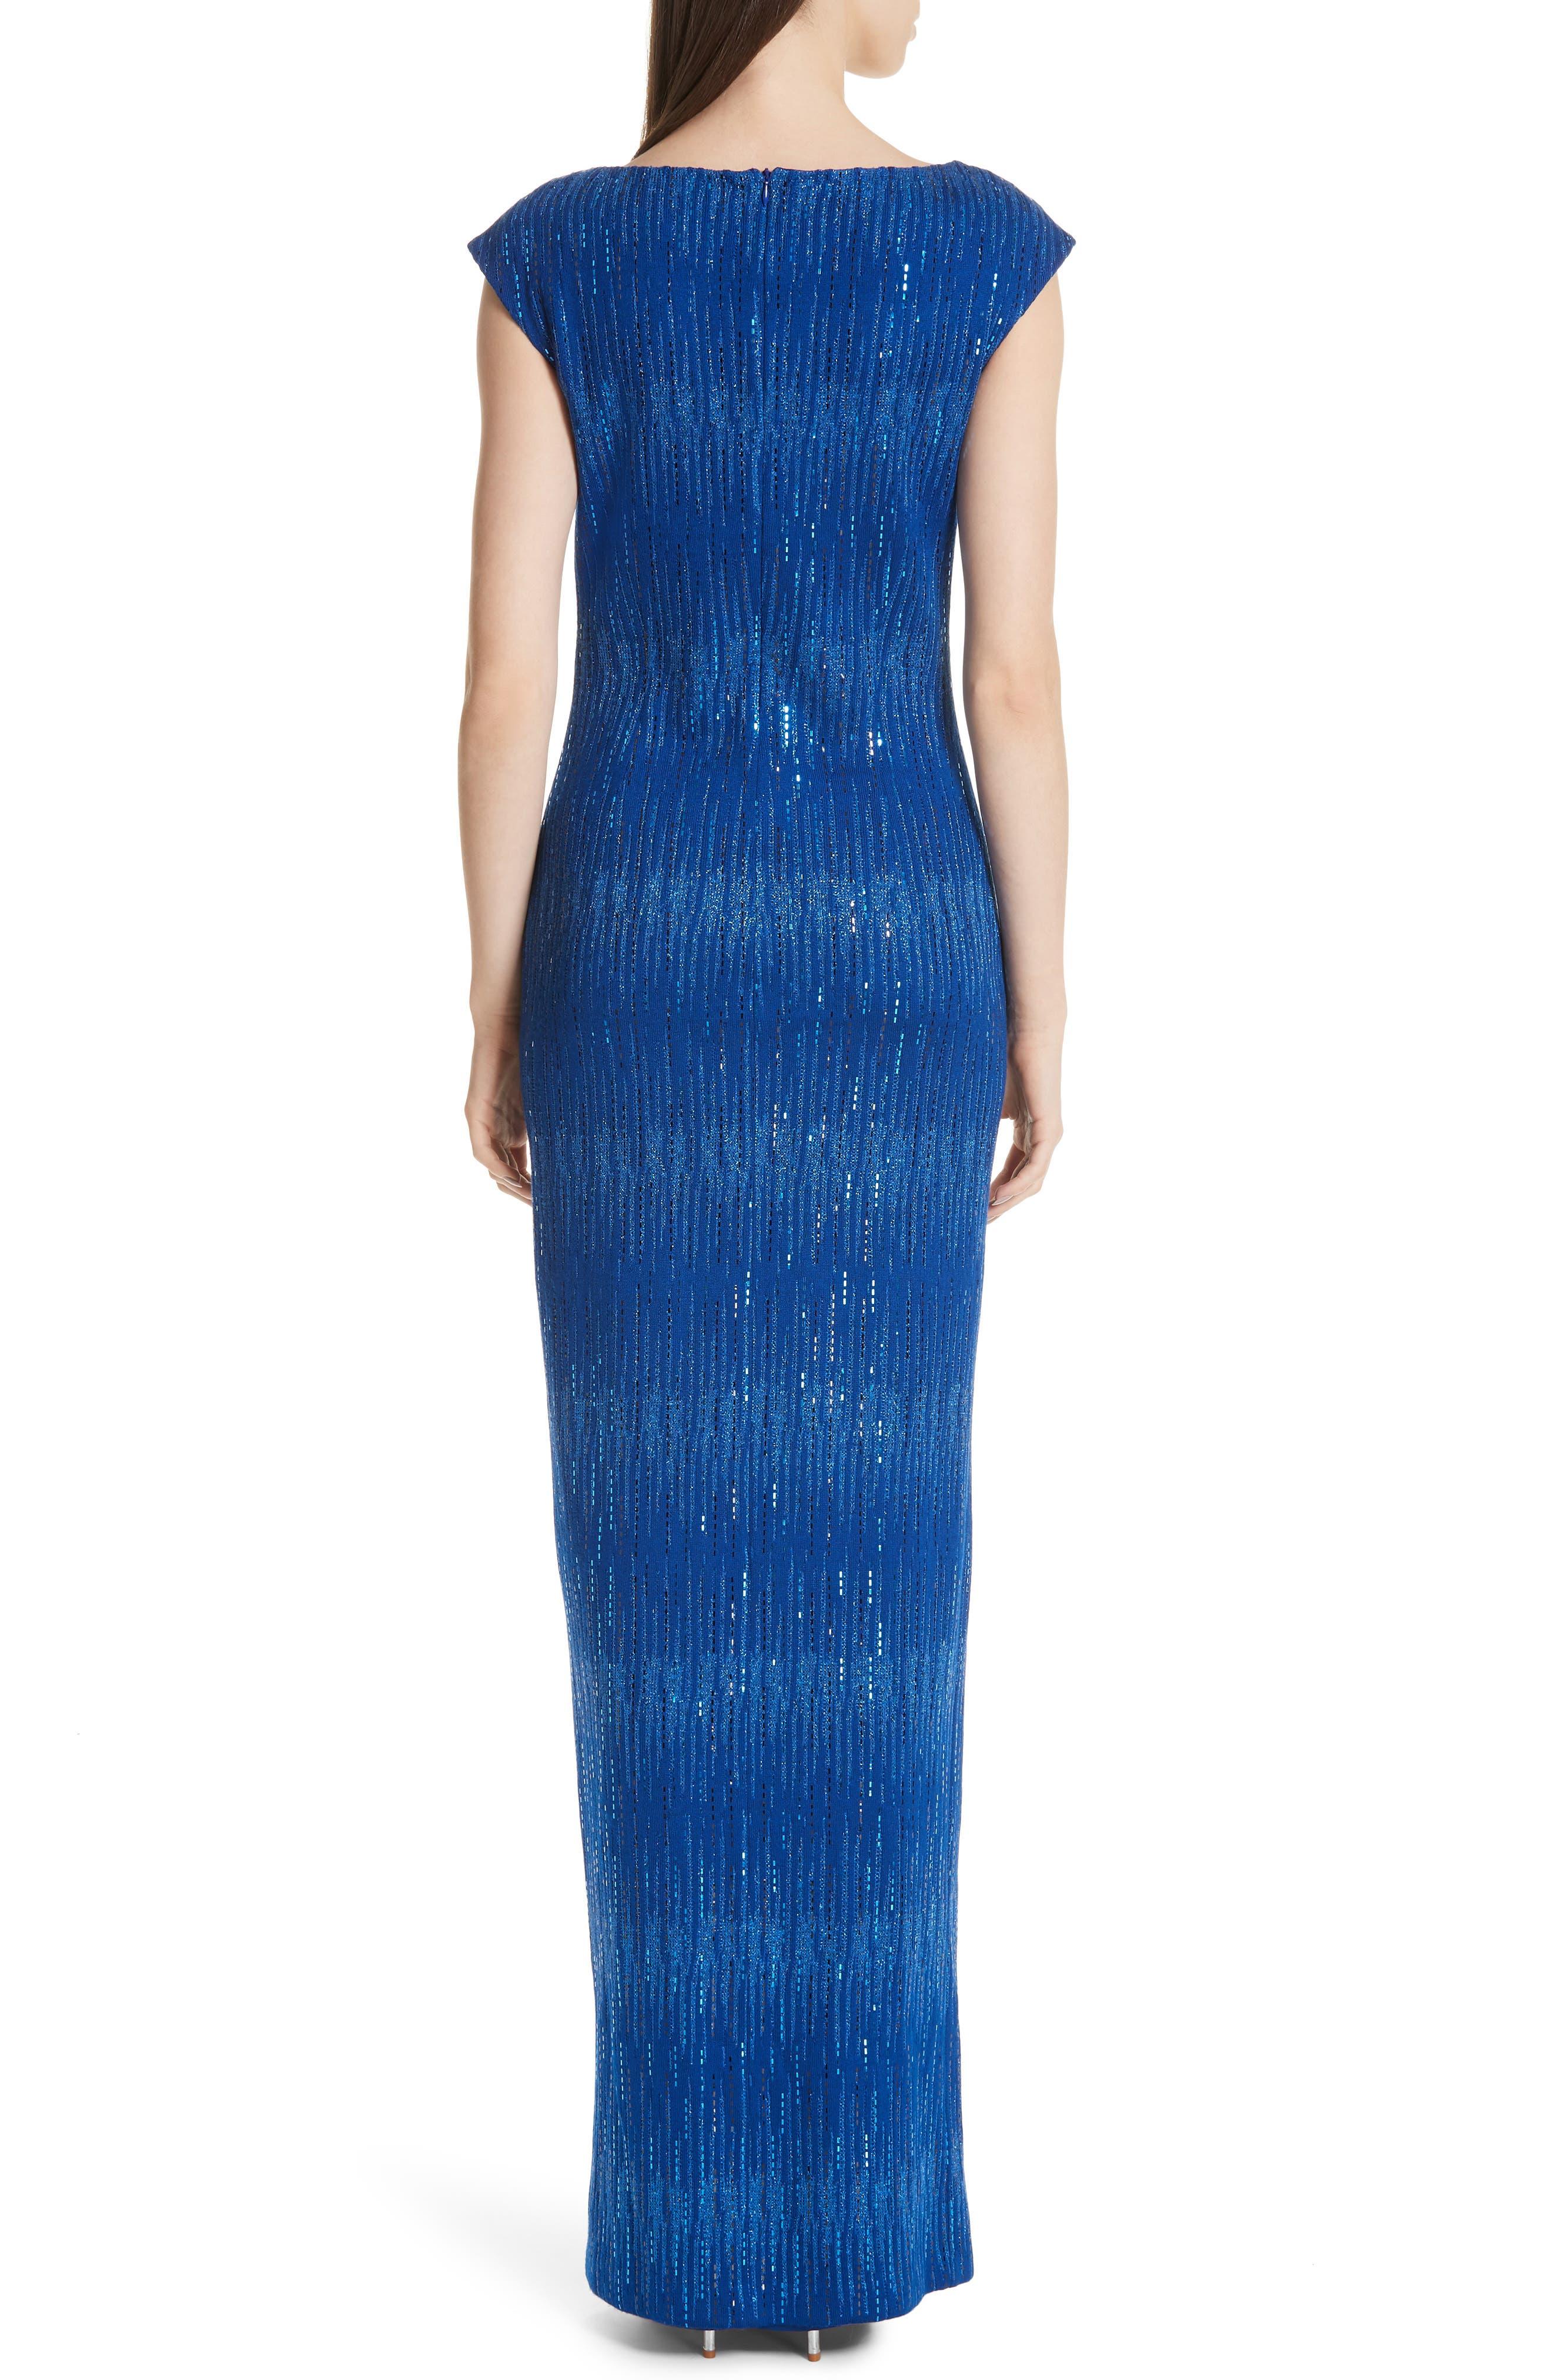 ST. JOHN COLLECTION, Asymmetrical Neck Carrie Knit Evening Dress, Alternate thumbnail 2, color, AZUL